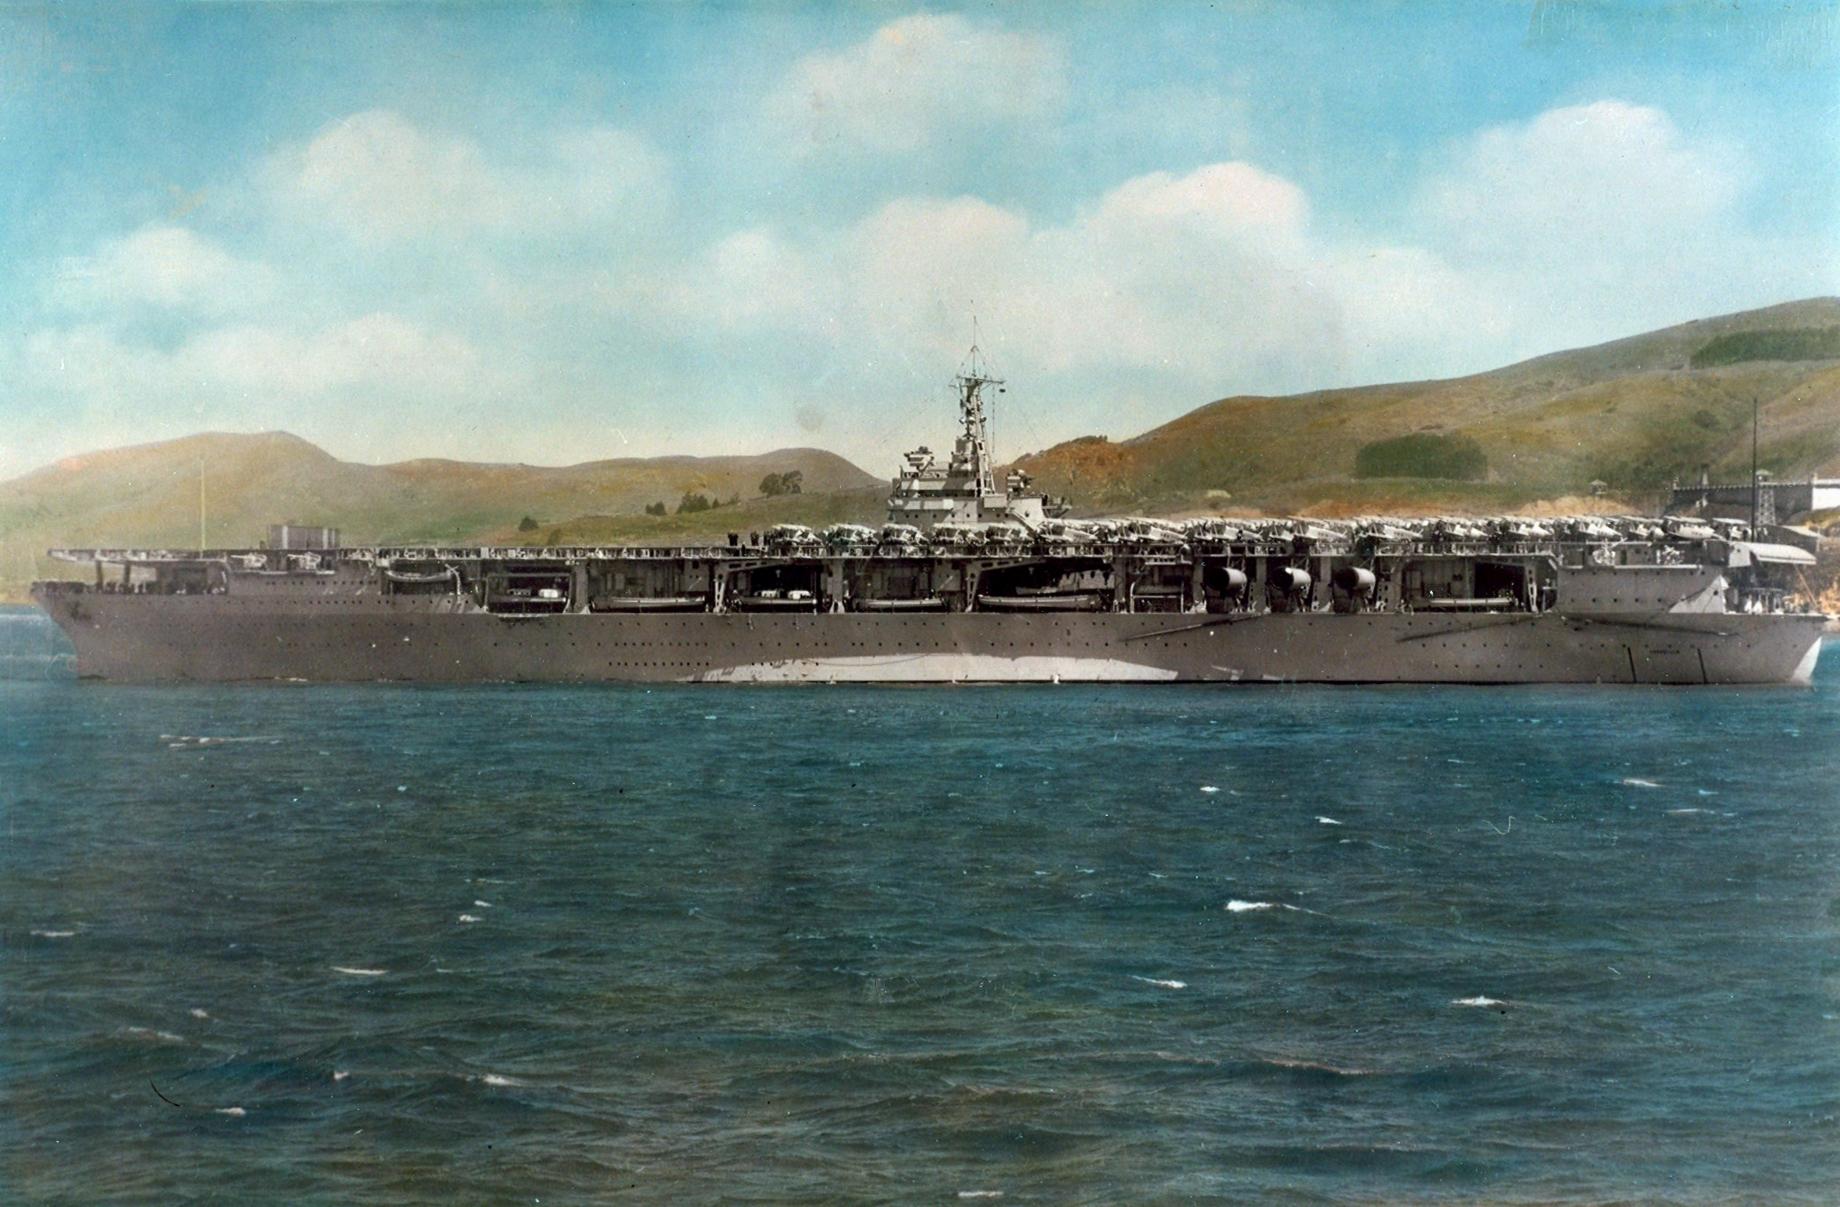 USS_Ranger_(CV-4)_at_anchor_in_1936.jpeg